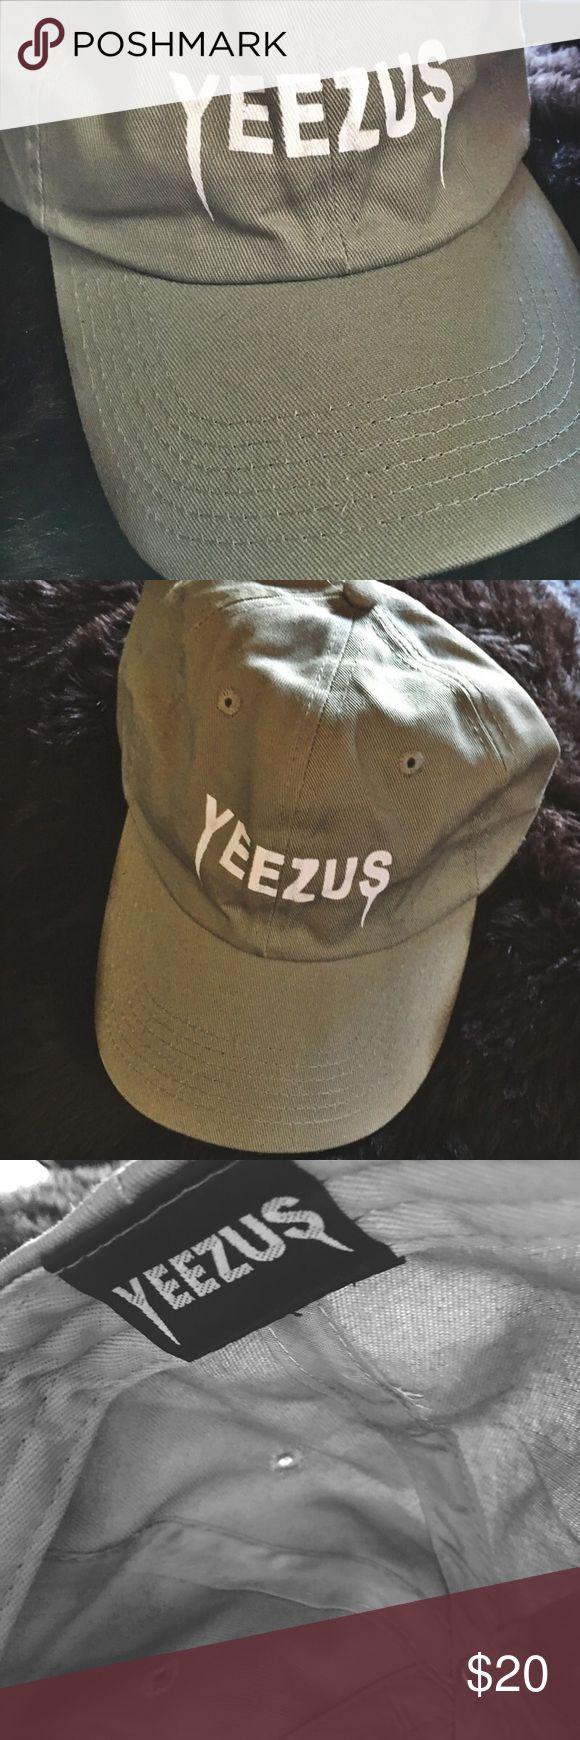 Yeezus Tour Dad Cap From the Yeezus Tour Merchandise Collection. Yeezy Accessories Hats